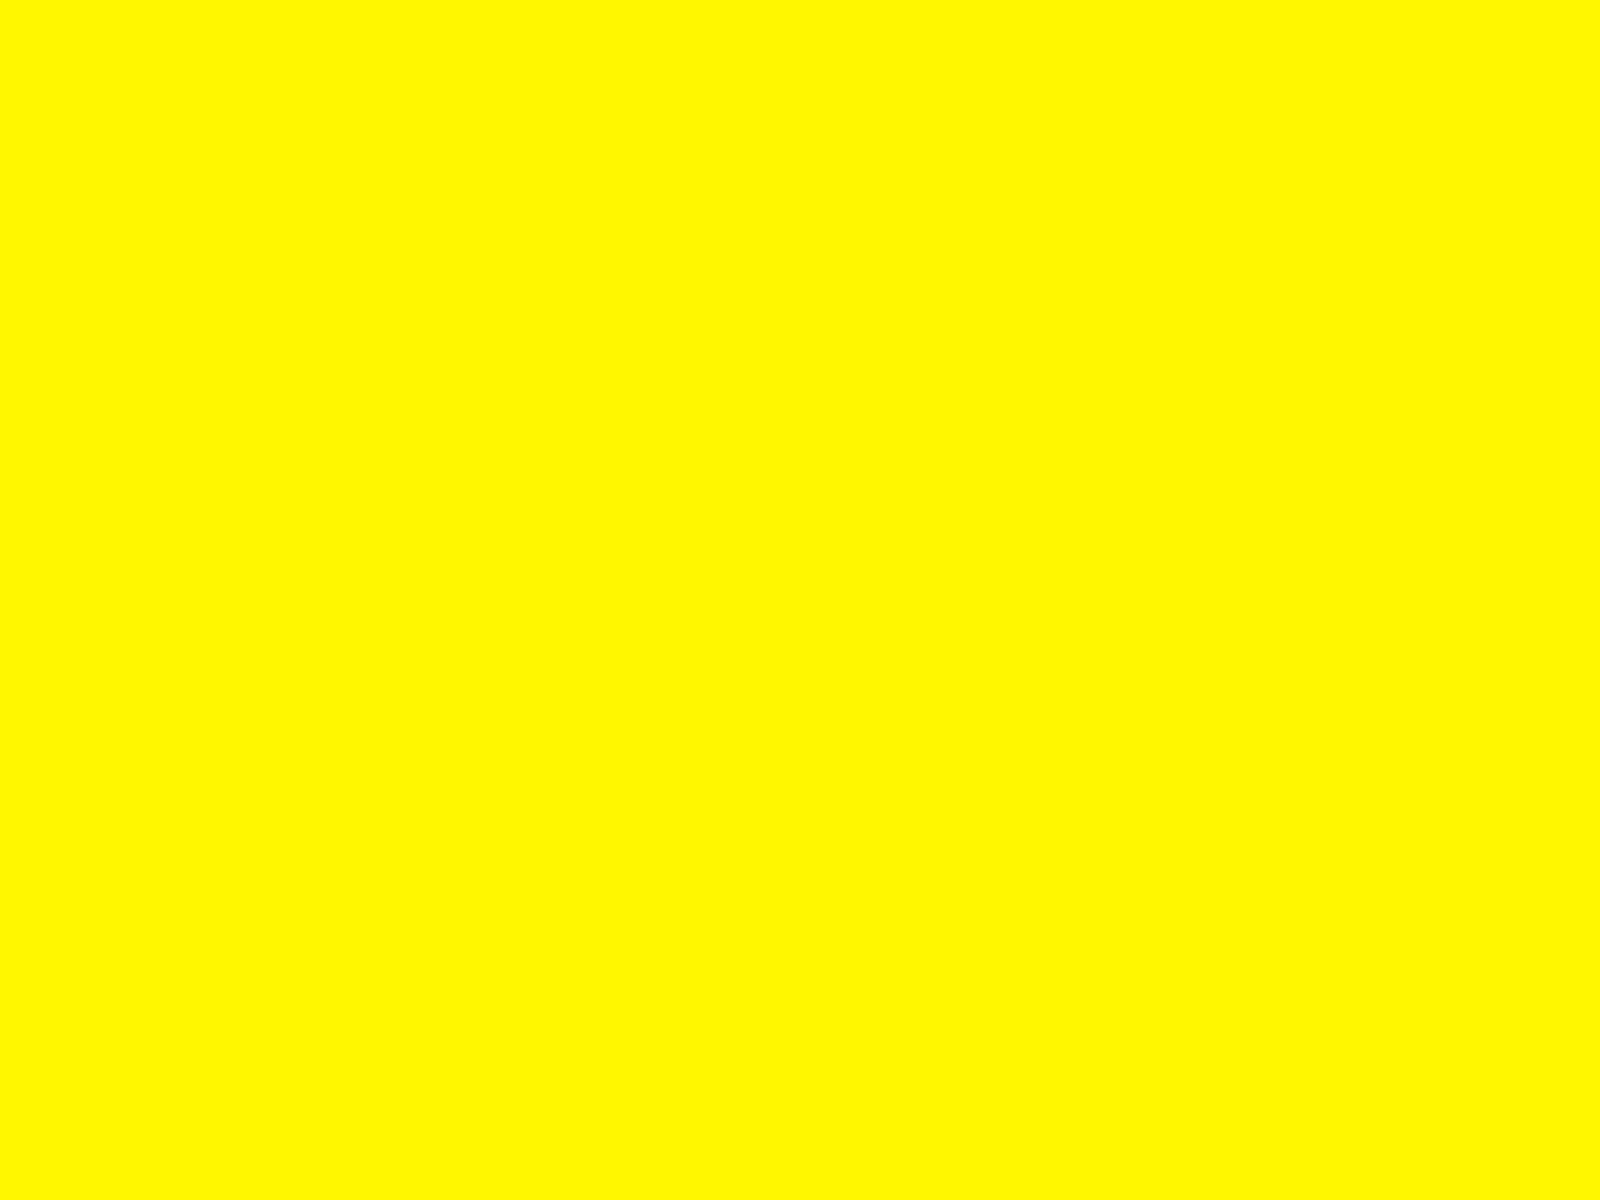 1600x1200 Lemon Solid Color Background